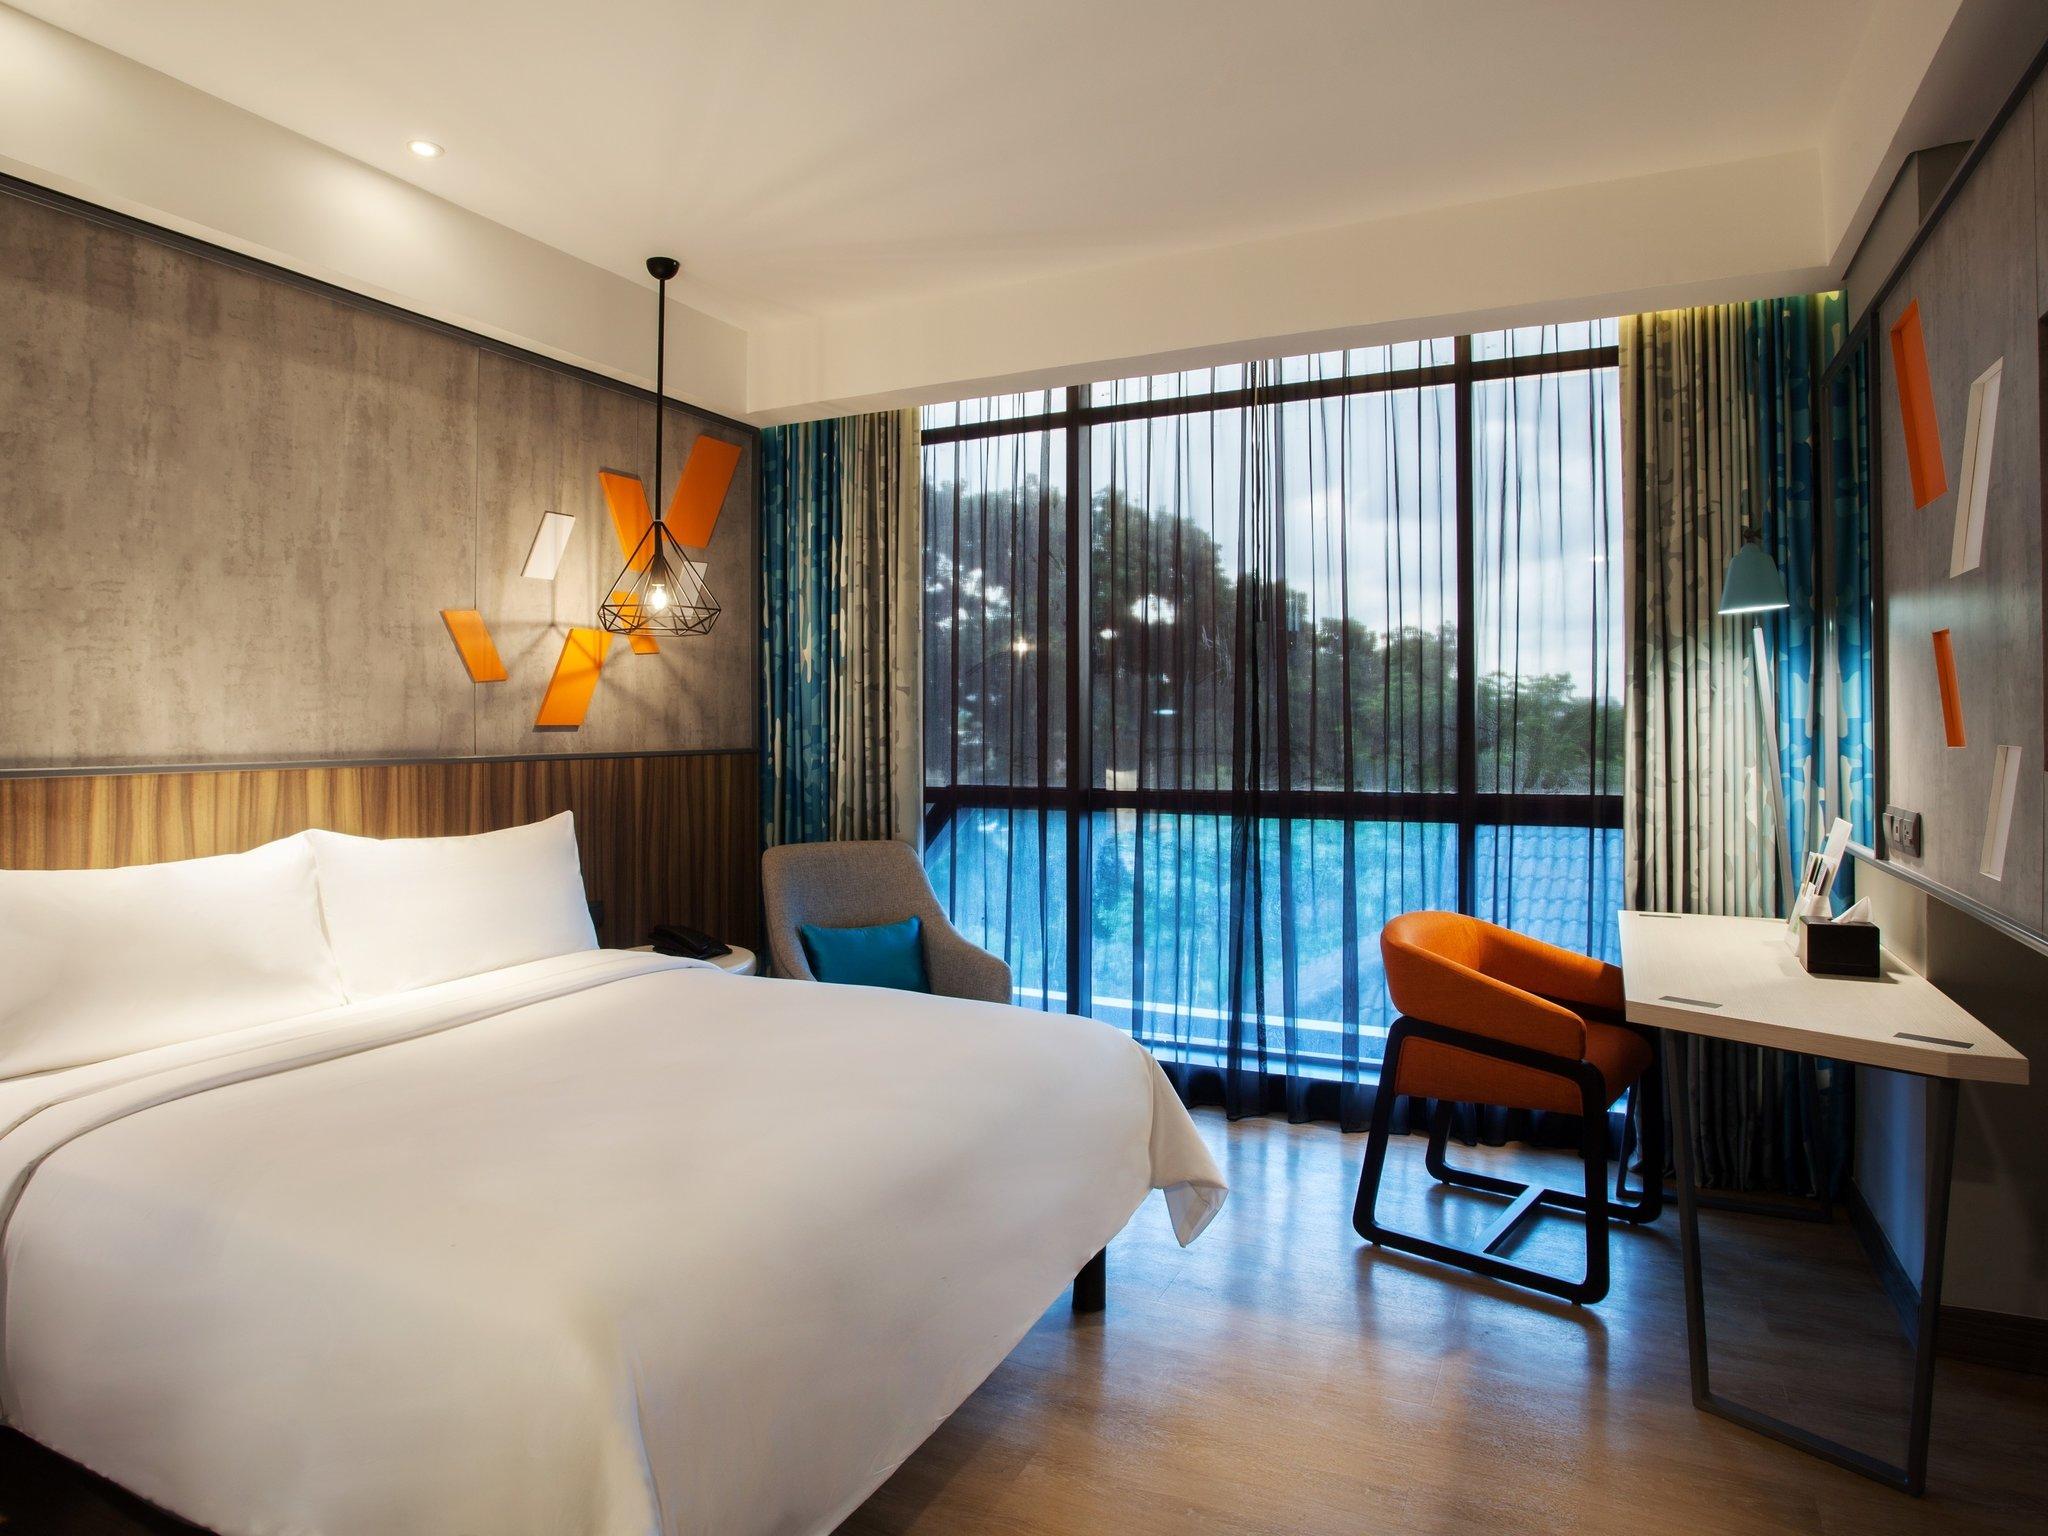 Hotel In Medan Ibis Styles Medan Pattimura Accor